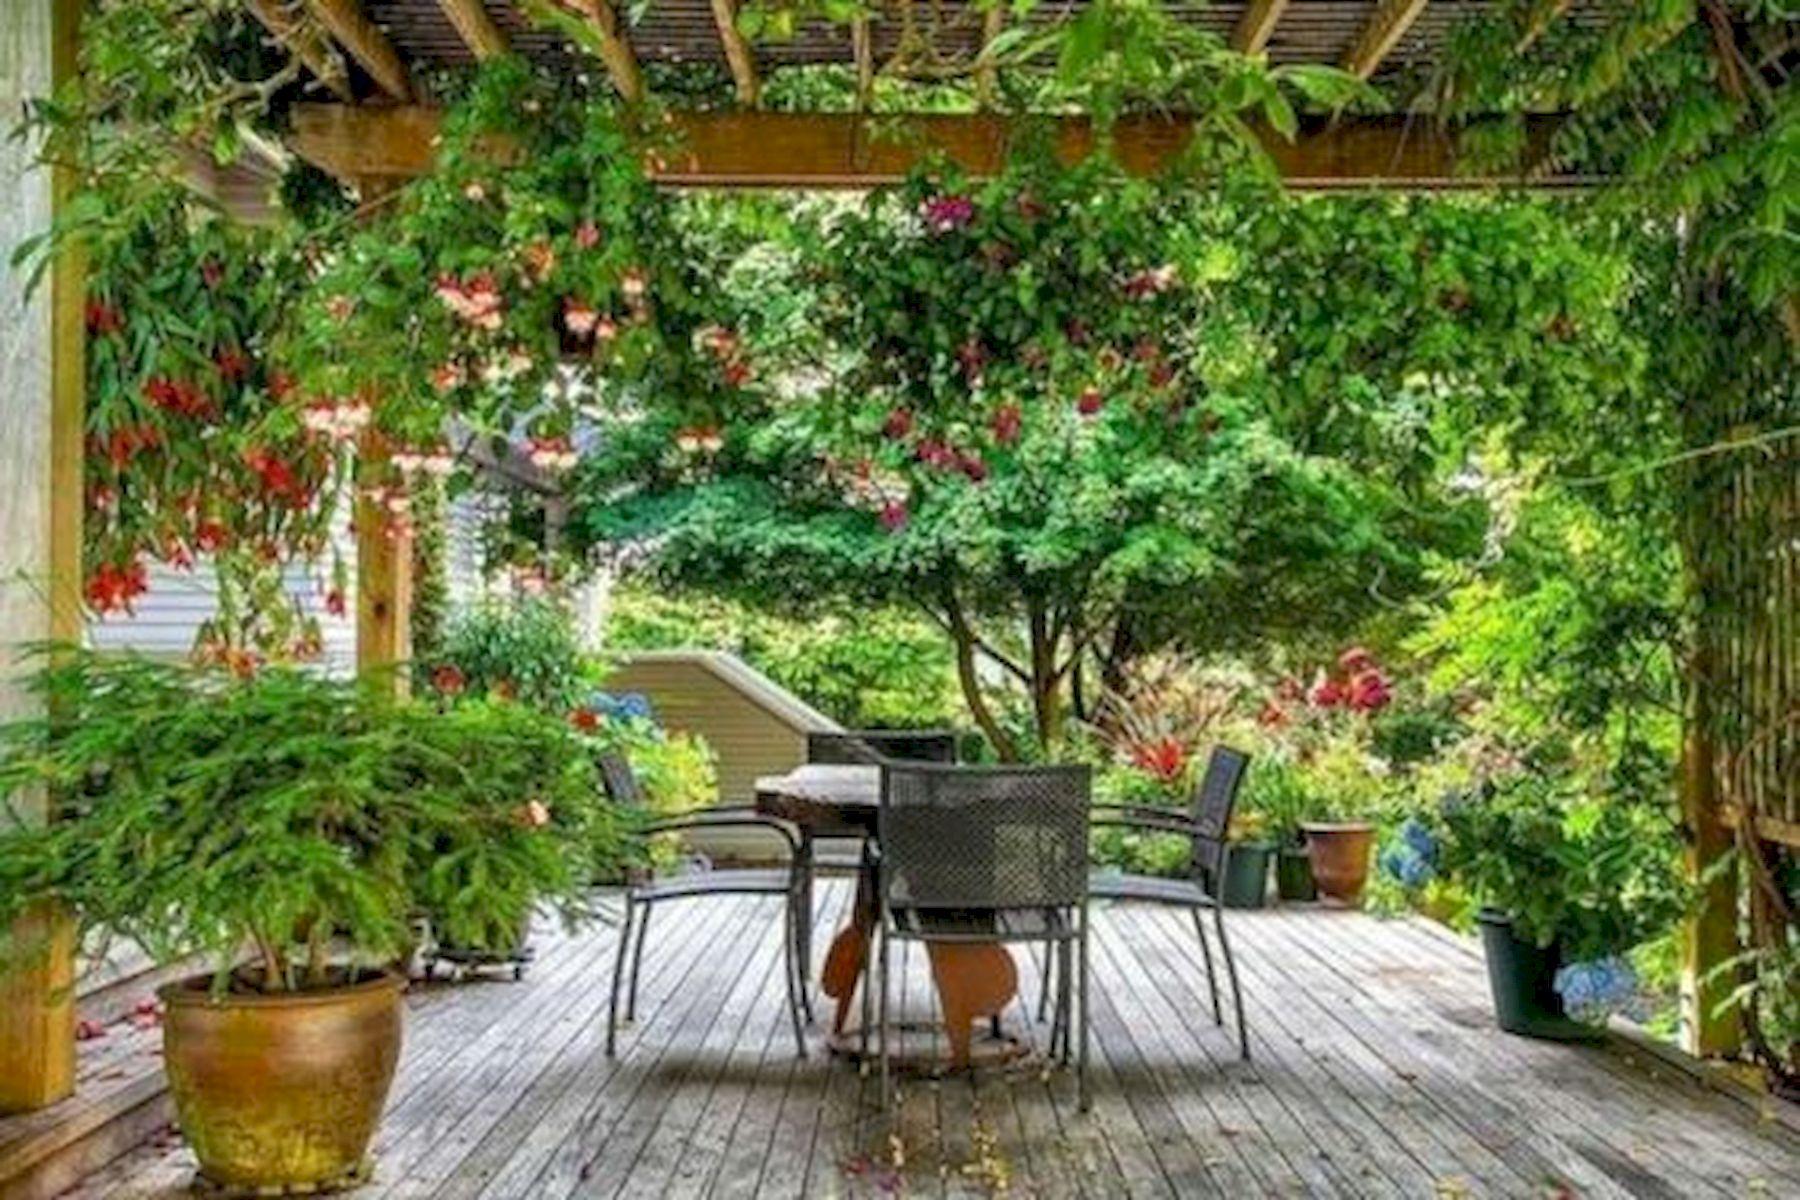 50 Awesome DIY Hanging Plants Ideas For Modern Backyard Garden (35)